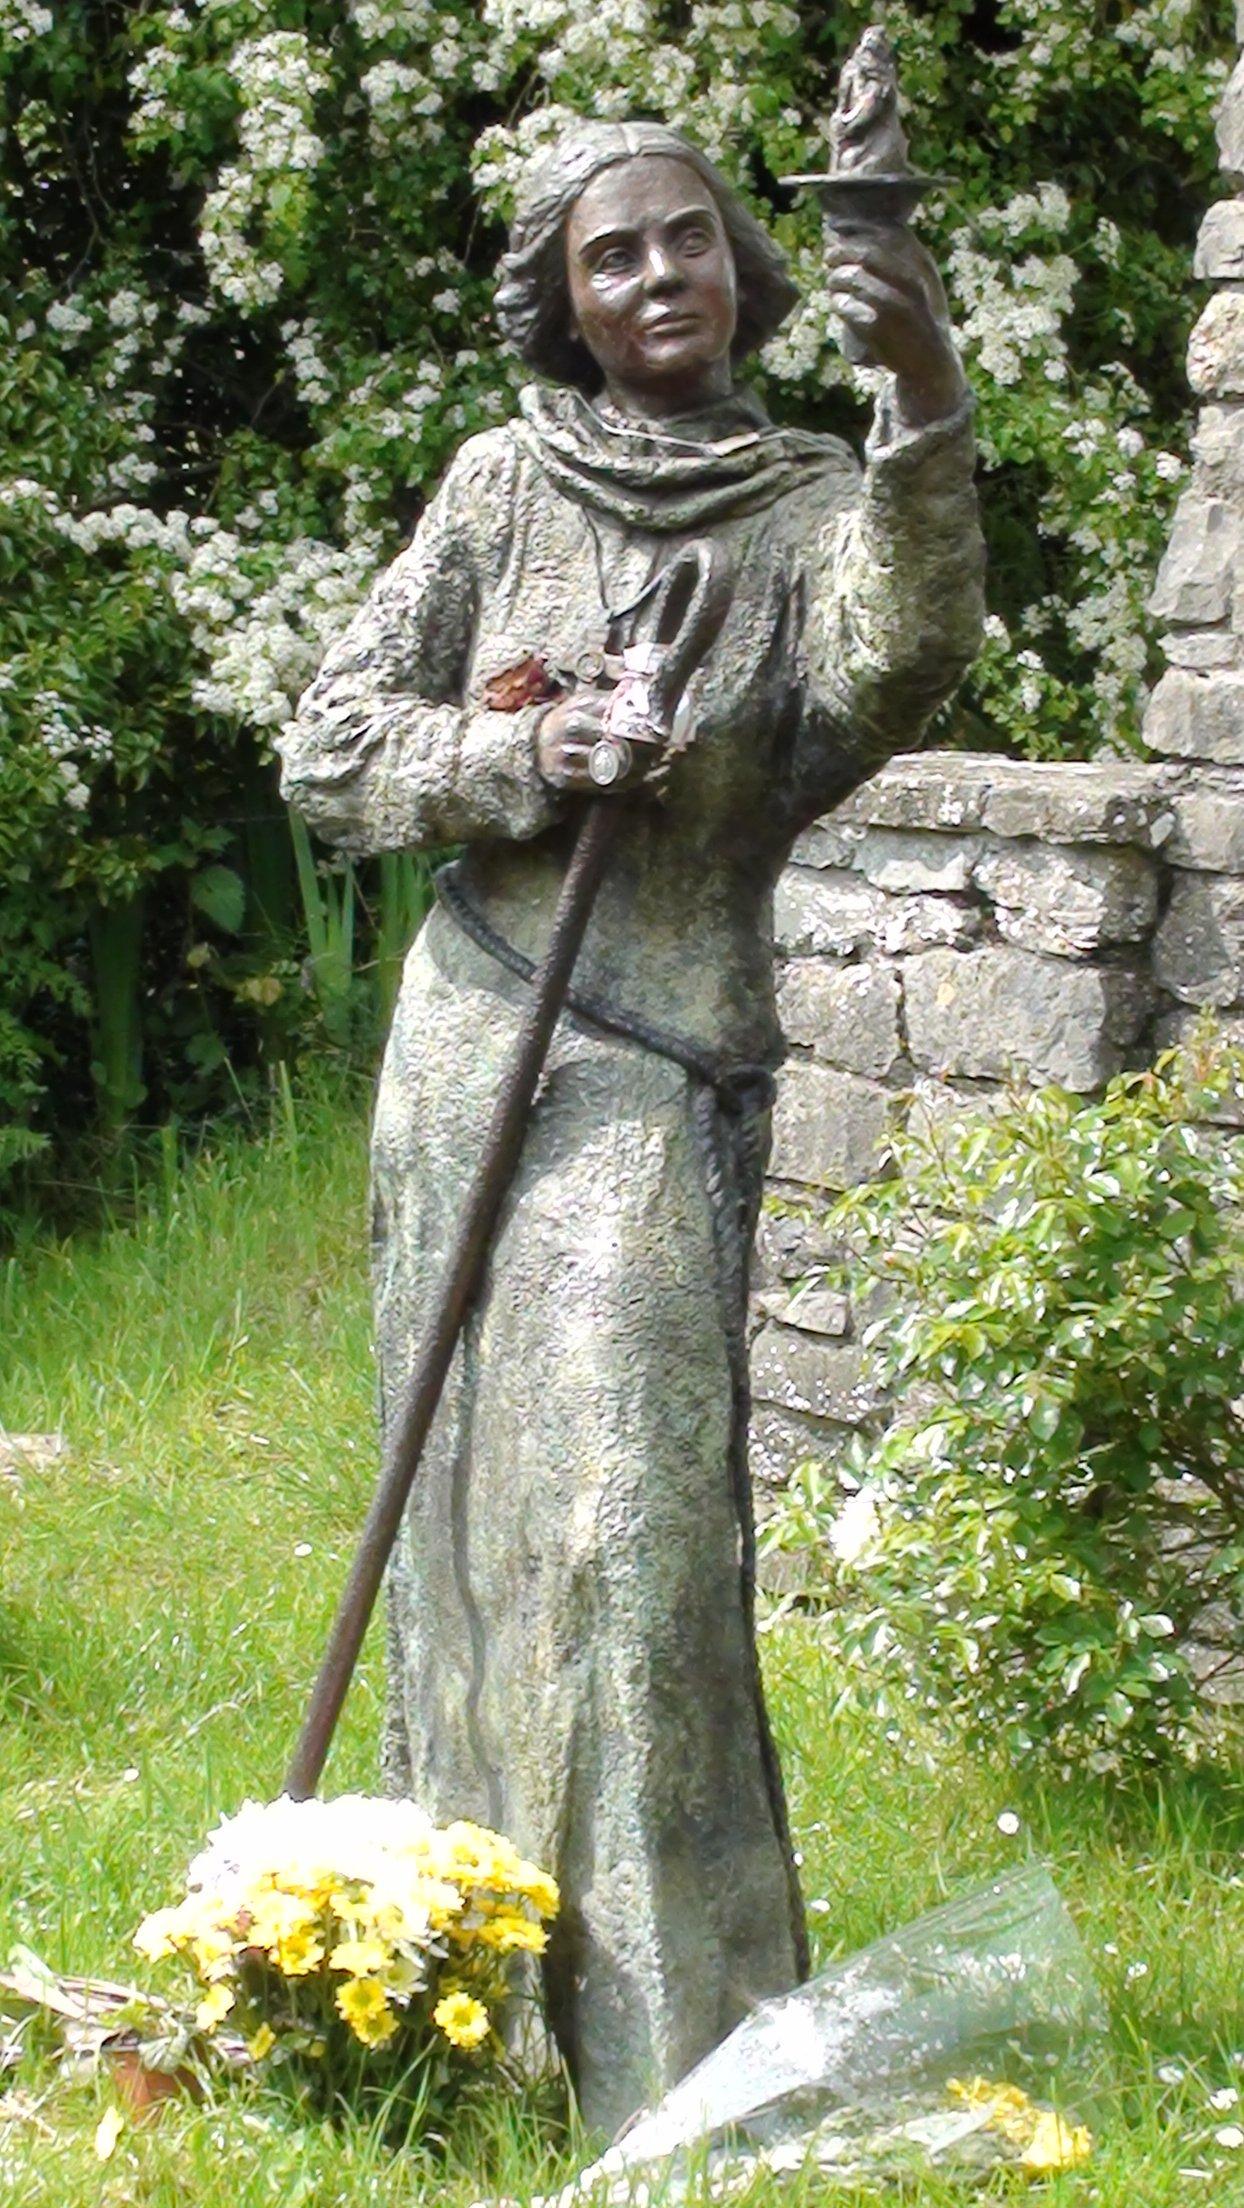 Saint Brigid near Kildare